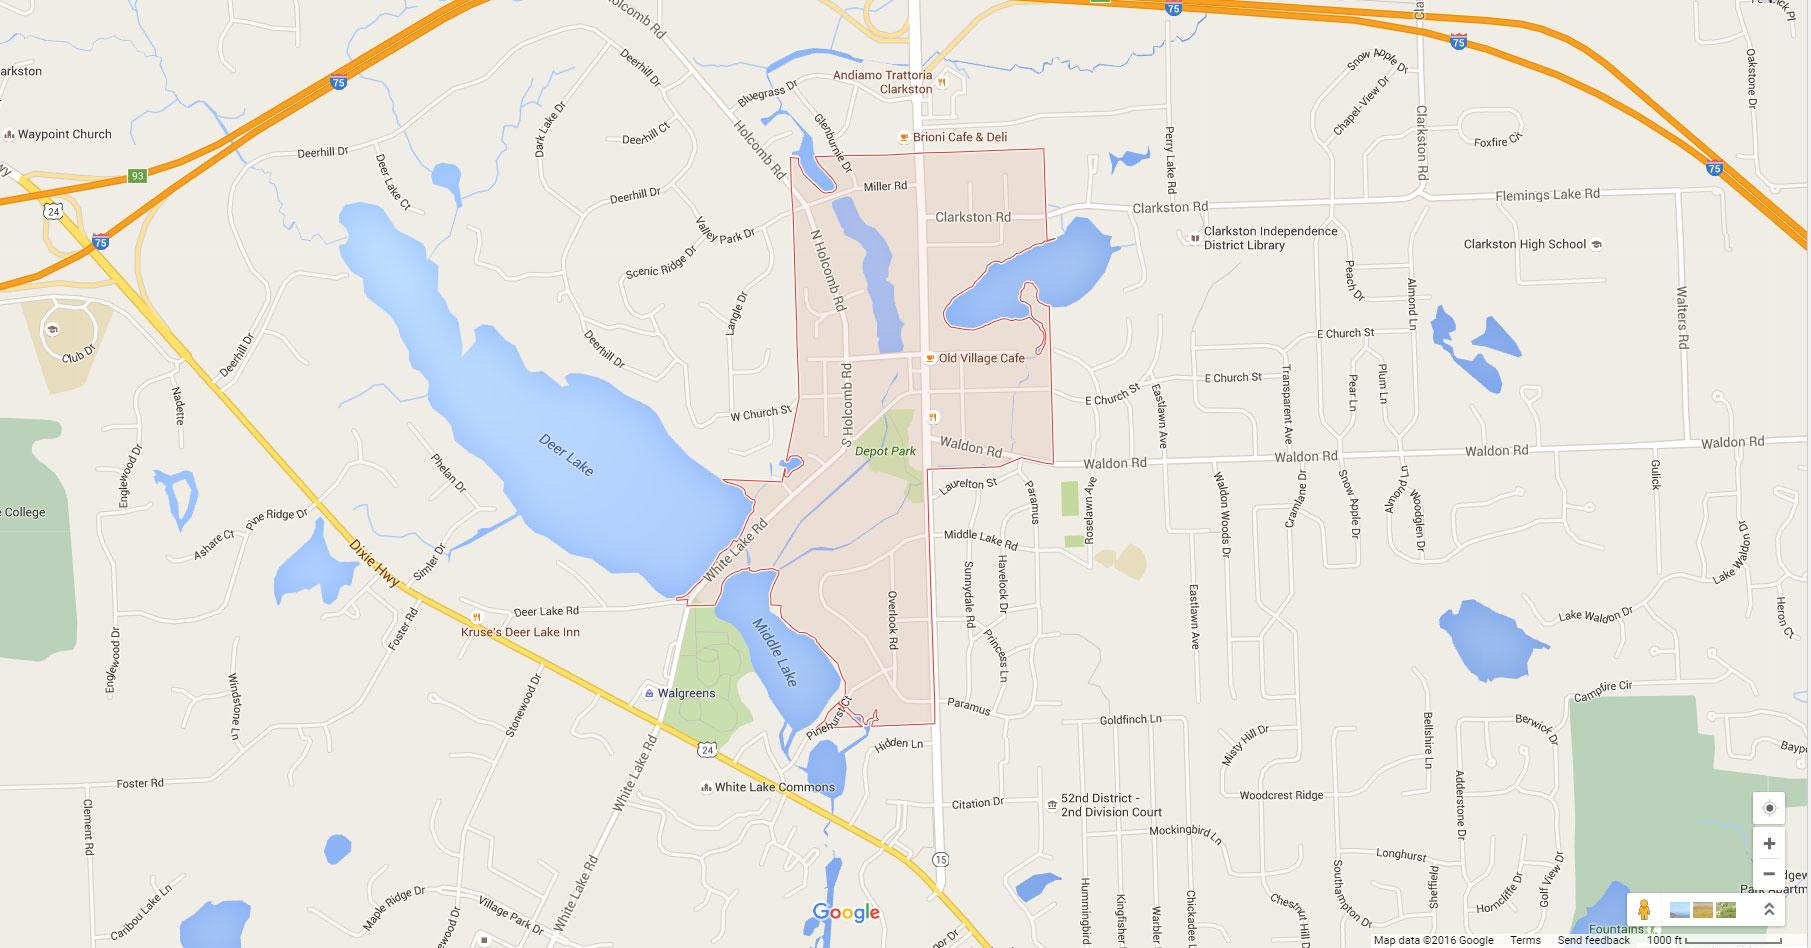 Detroit Michigan Map Google.Clarkston Located Michigan Detroit Commercial Photographer Near